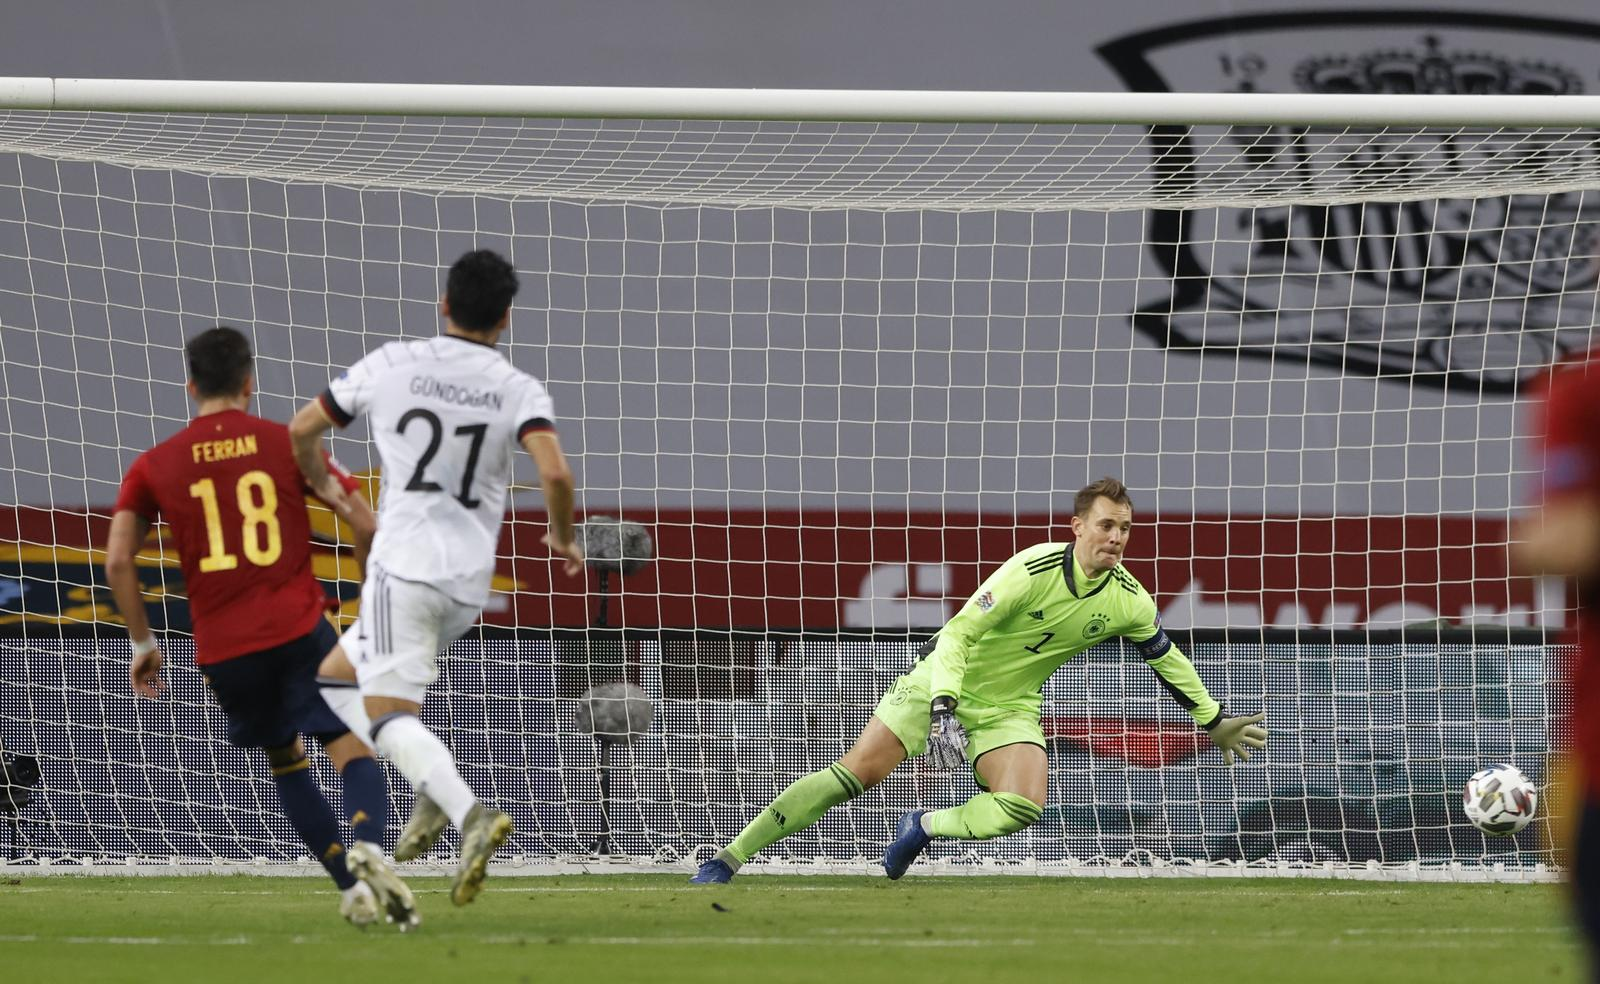 UEFA Nations League - Group D - Spain v Germany - Estadio La Cartuja, Seville, Spain - November 17, 2020 Spain's Ferran Torres scores their fifth goal. Photo: Reuters